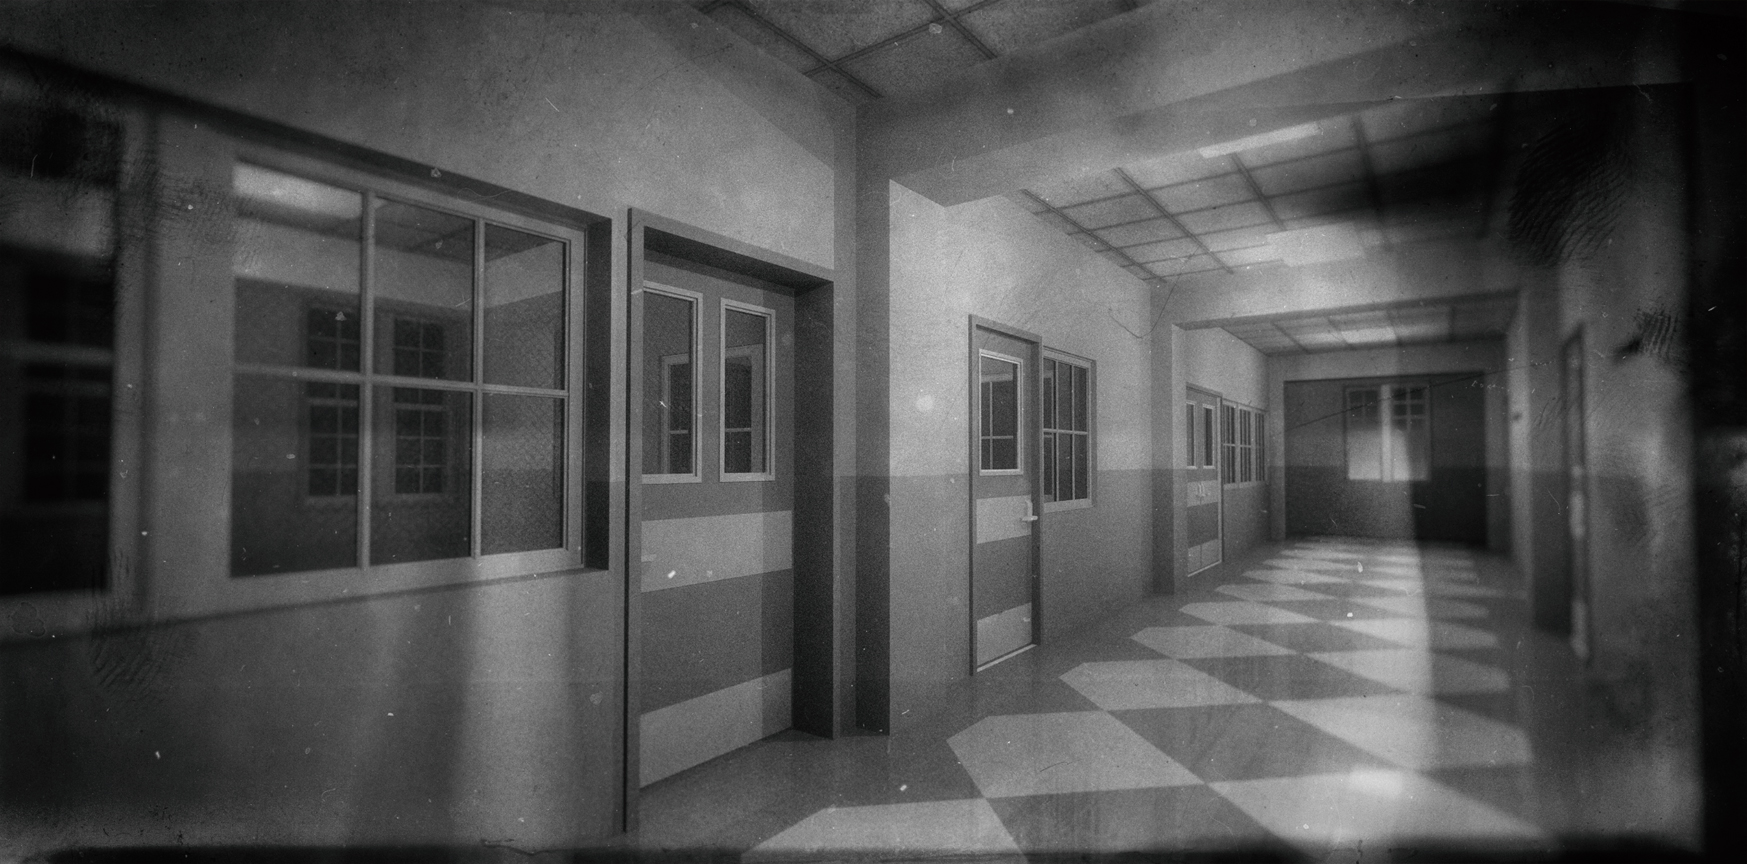 TARRYTOWN PSYCHIATRIC HOSPITAL (NEW WING)- 3D RENDERING